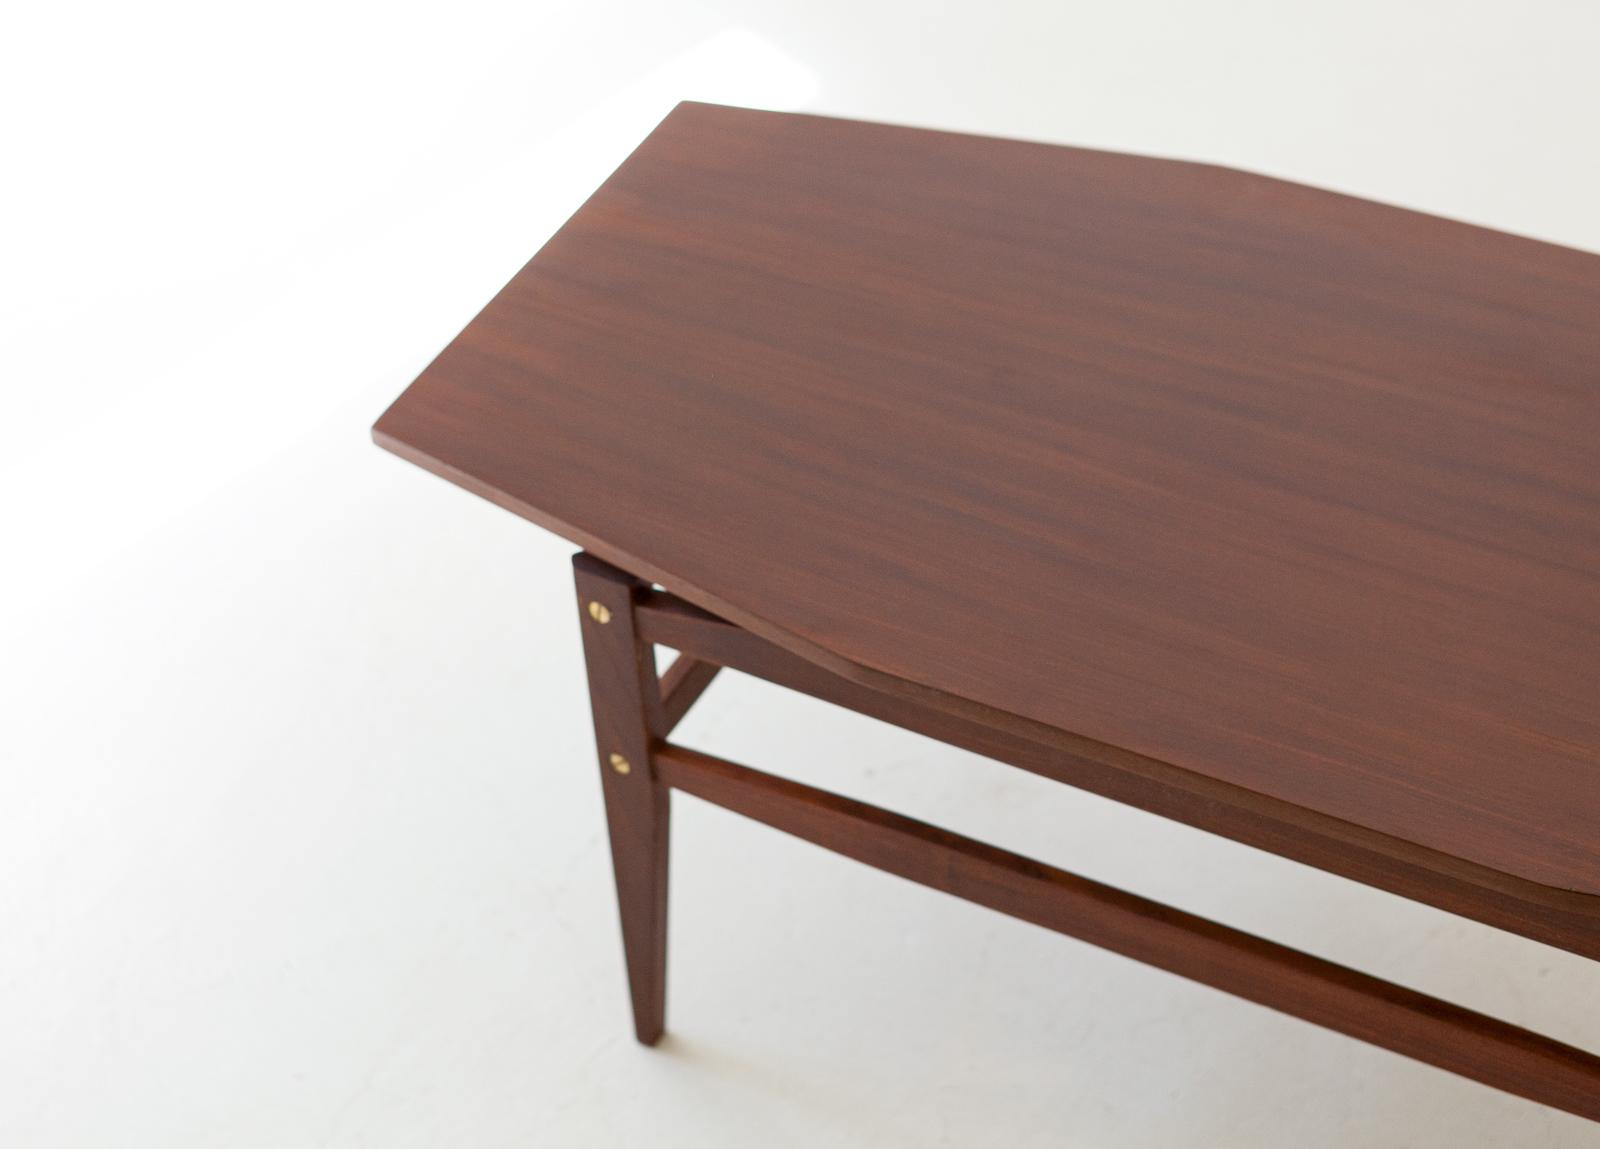 1950s-italian-modern-coffee-table-2-t90